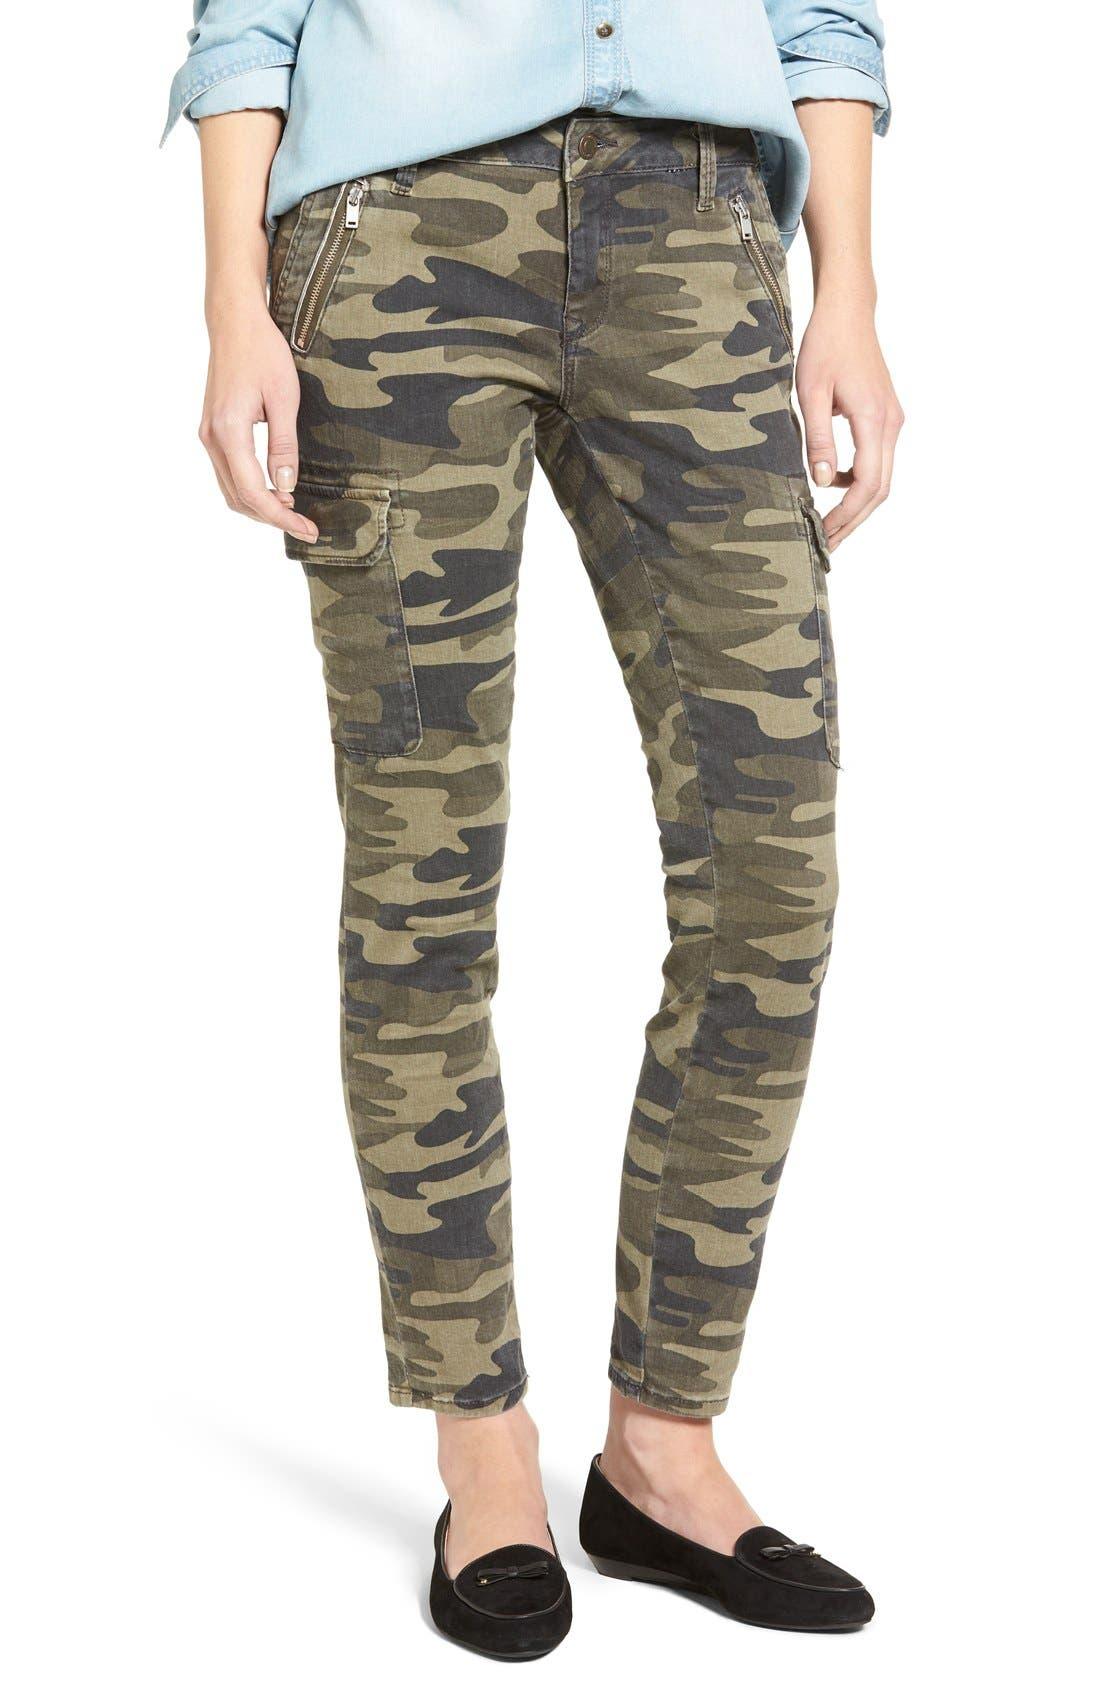 Alternate Image 1 Selected - Mavi Jeans Juliette Camo Print Military Cargo Pants